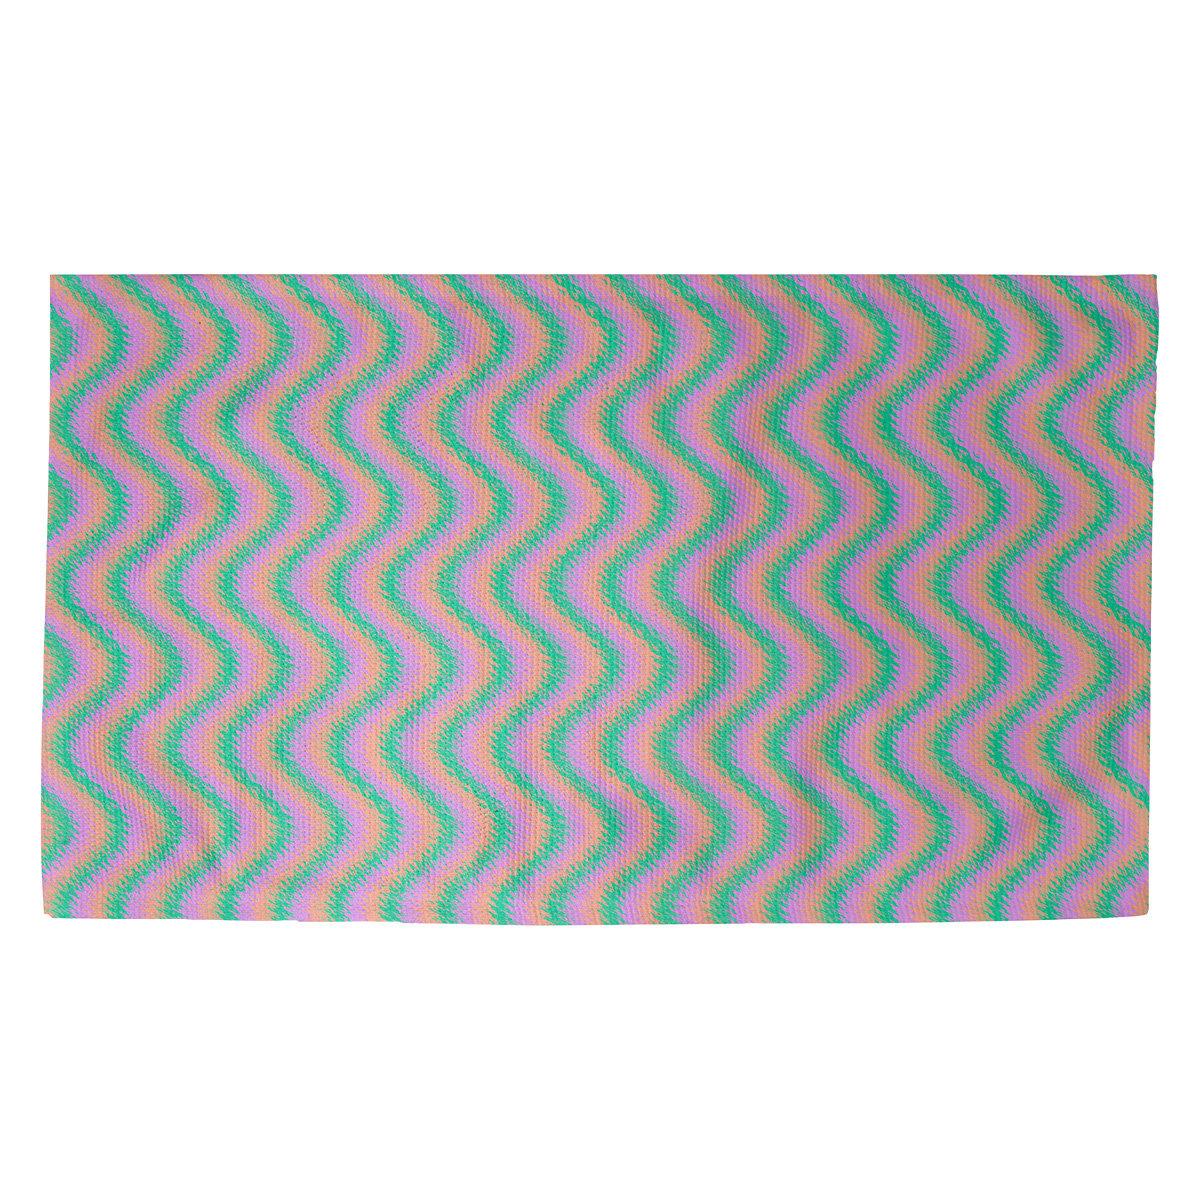 Latitude Run Avicia Wavy Stripe Green Purple Area Rug Wayfair